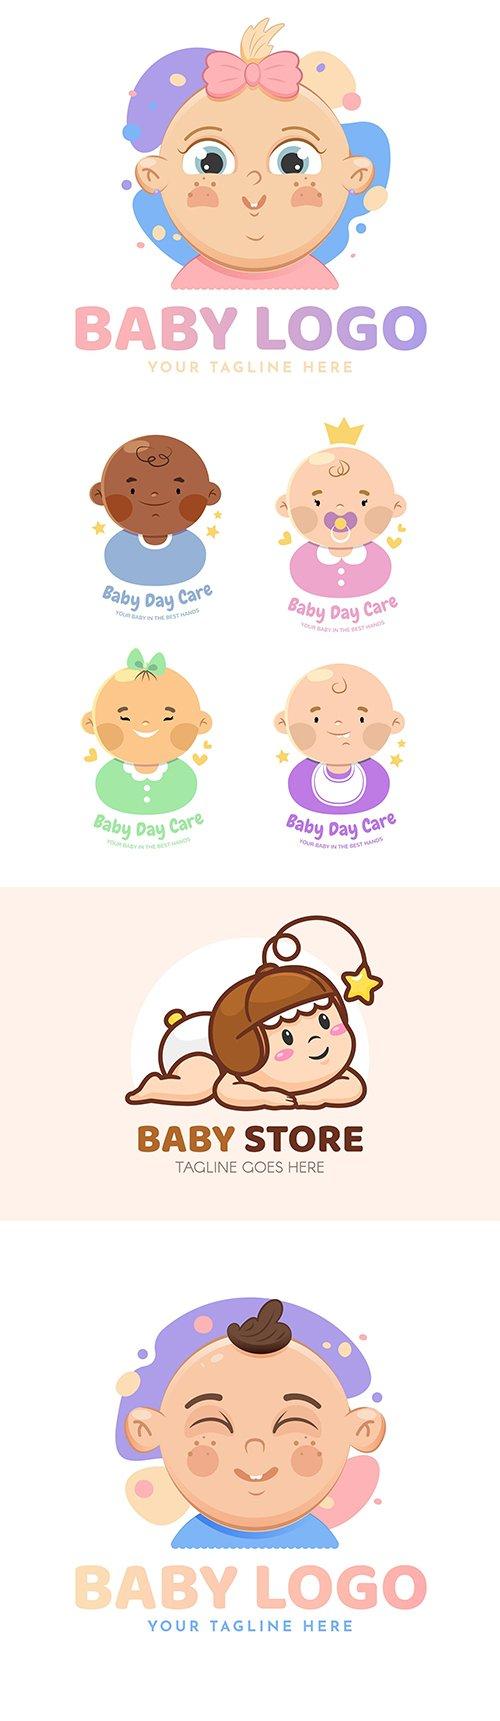 Baby logos brand name company design